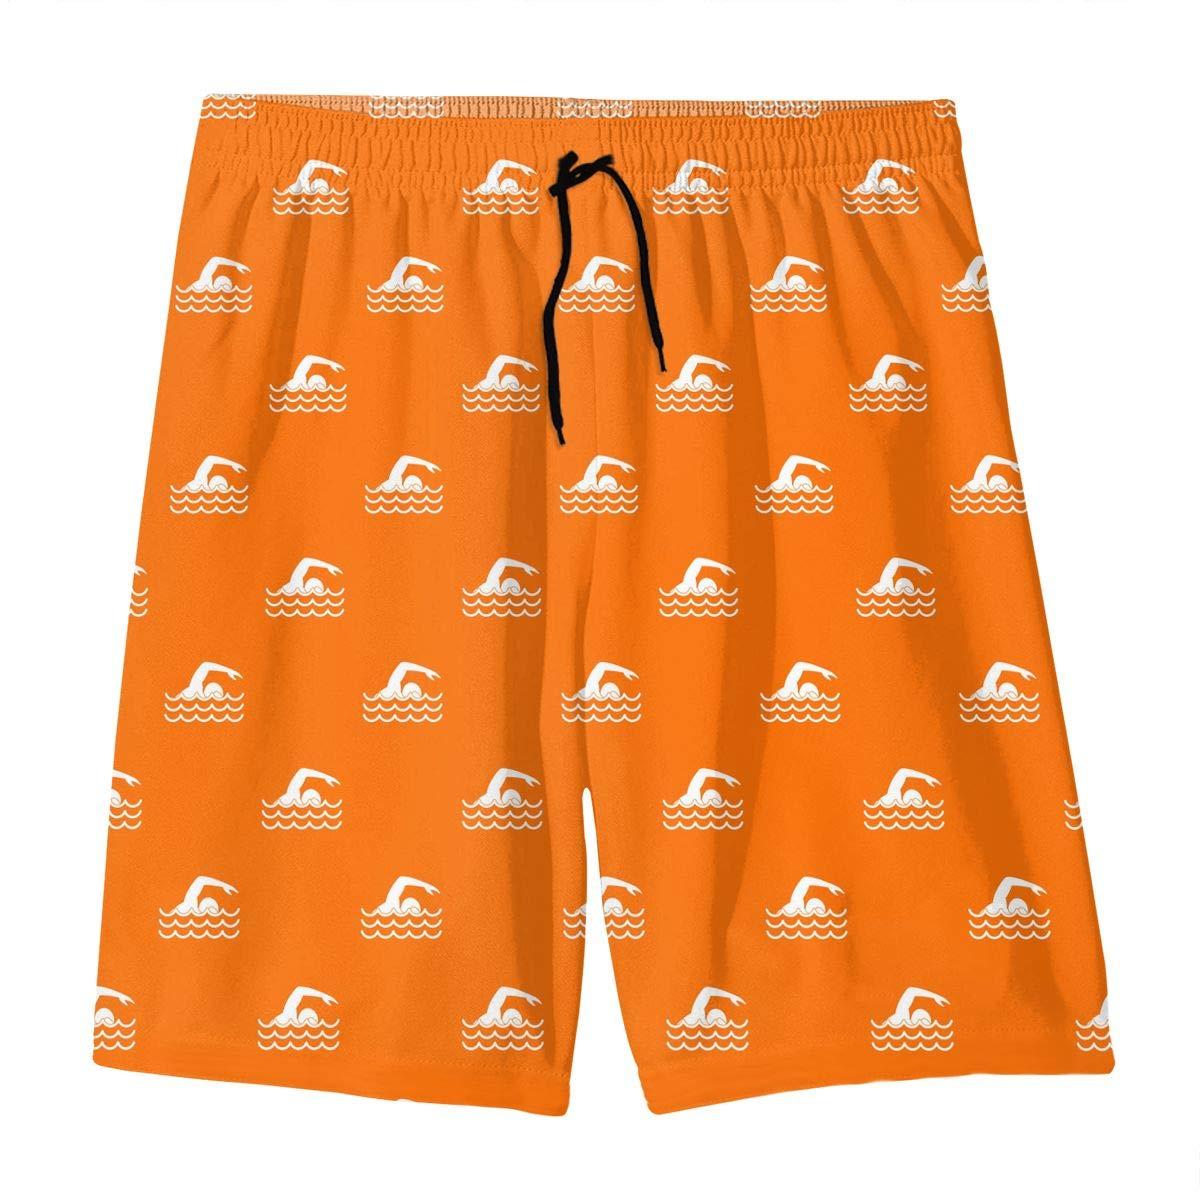 Polyester Swimmer Pattern Board Shorts with Pockets GI80@KU Youth Casual Swim Trunks